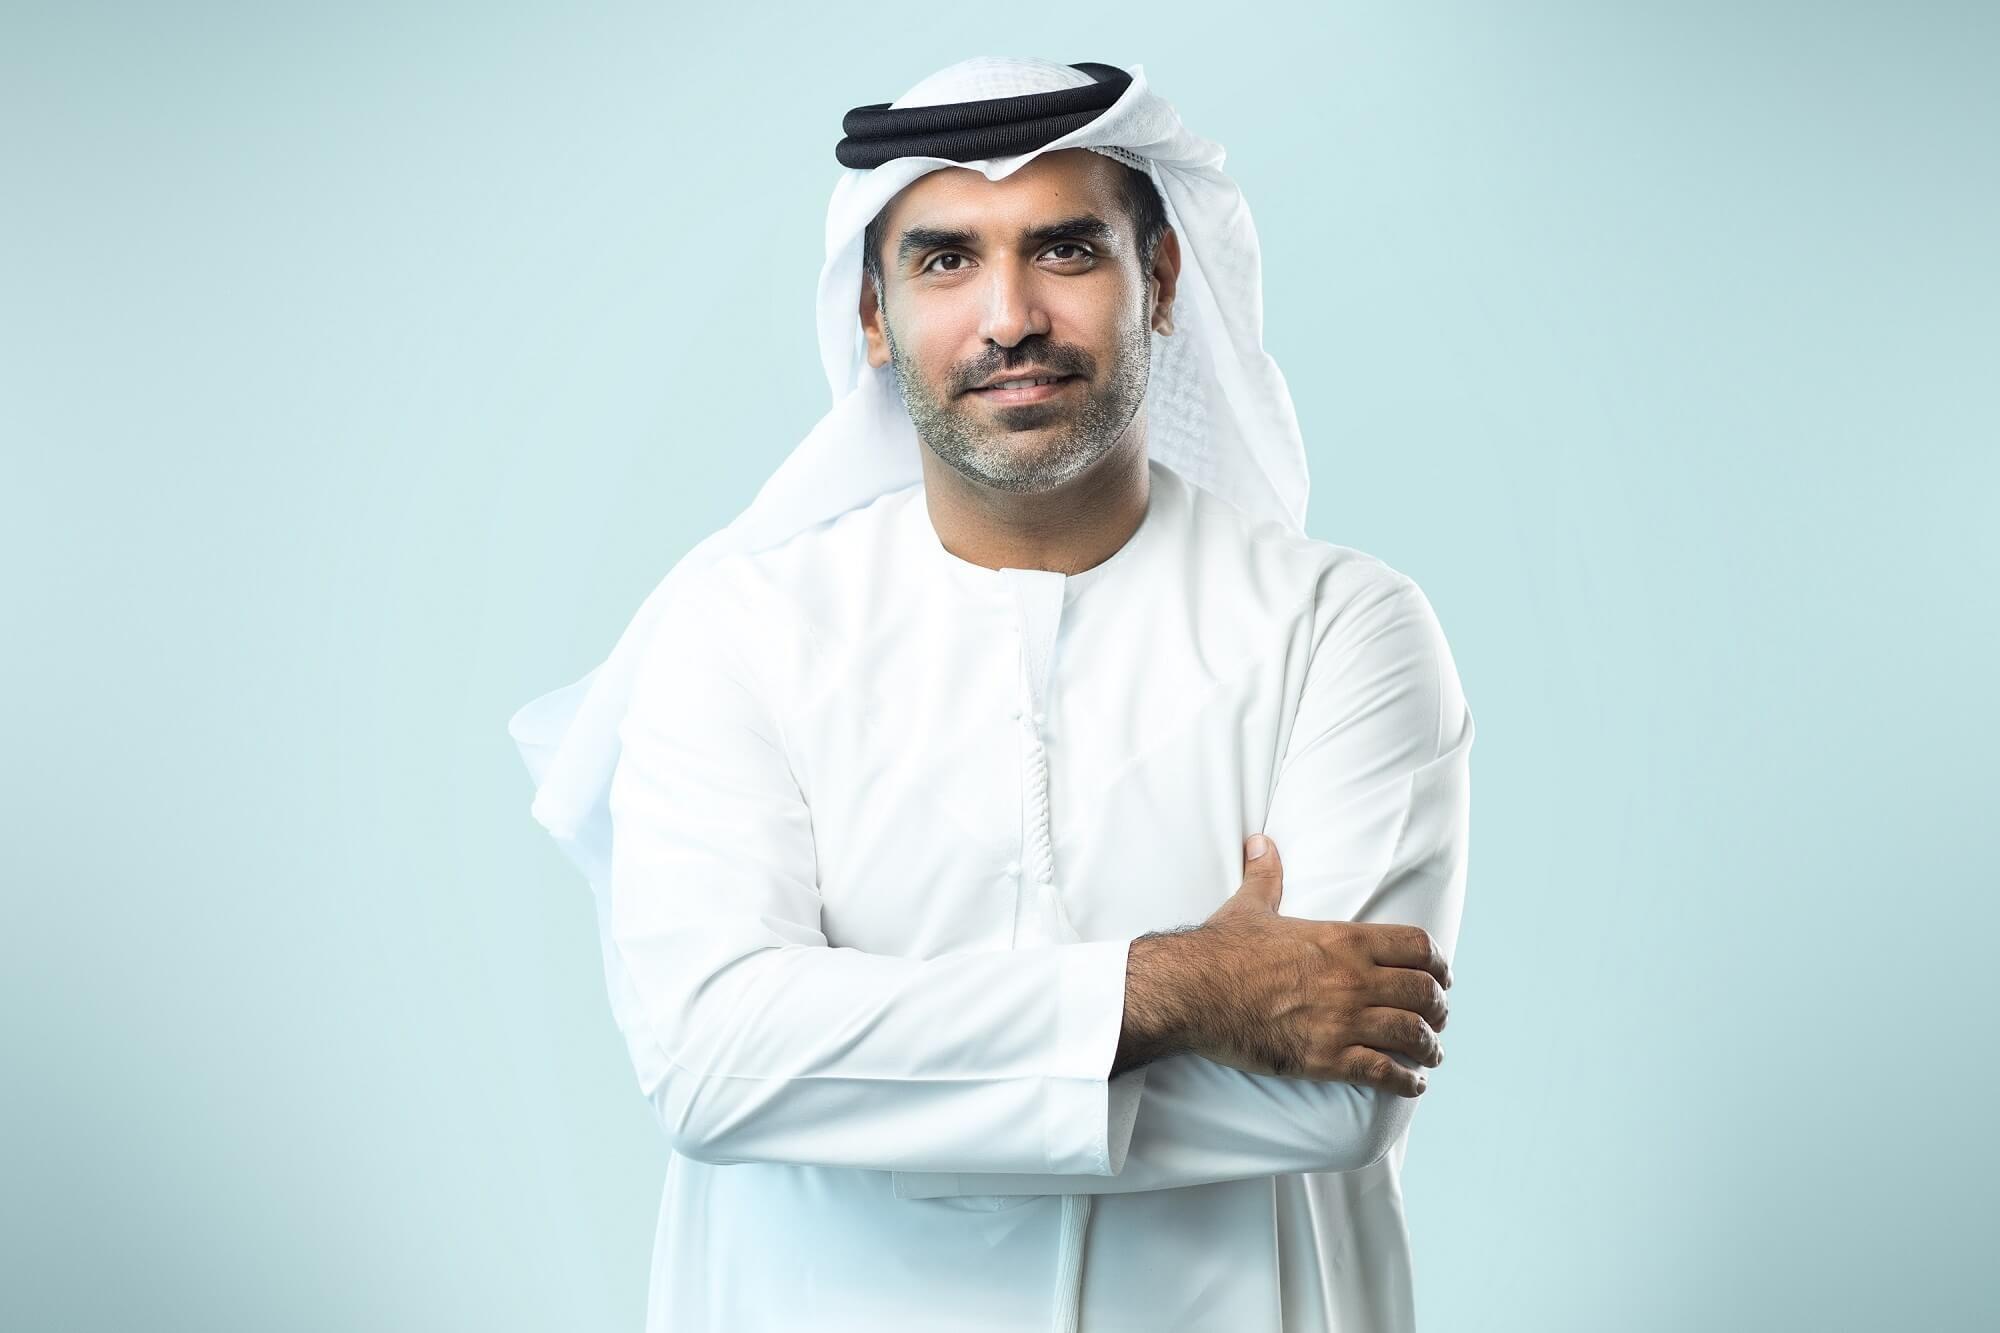 Can Dubai become the capital for next-gen healthtech startups?